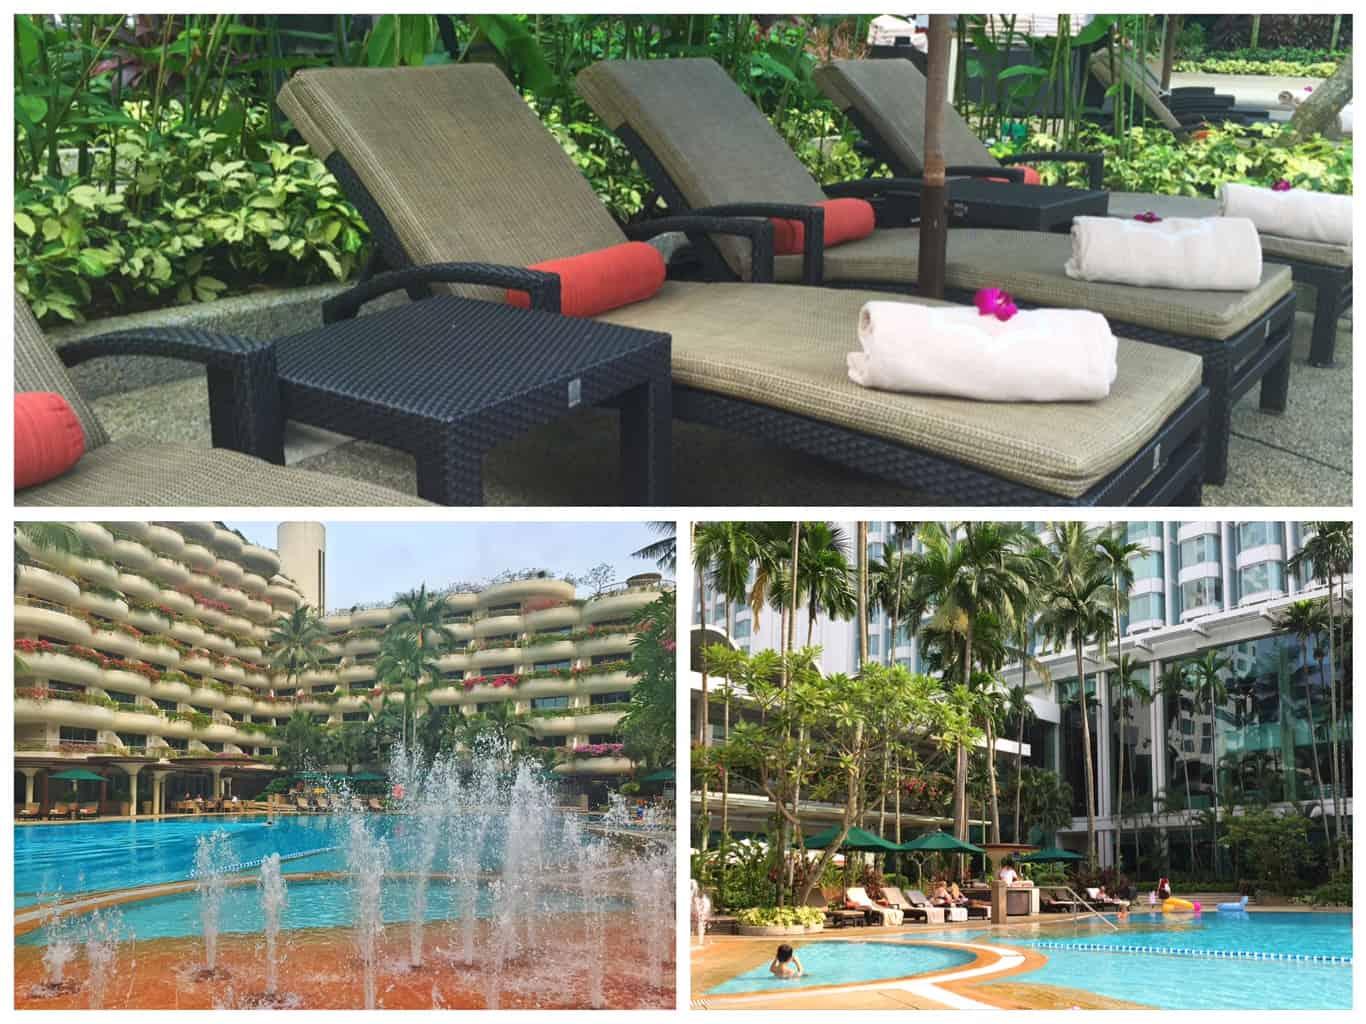 Hotel Review Shangri La Hotel Singapore Mum On The Move